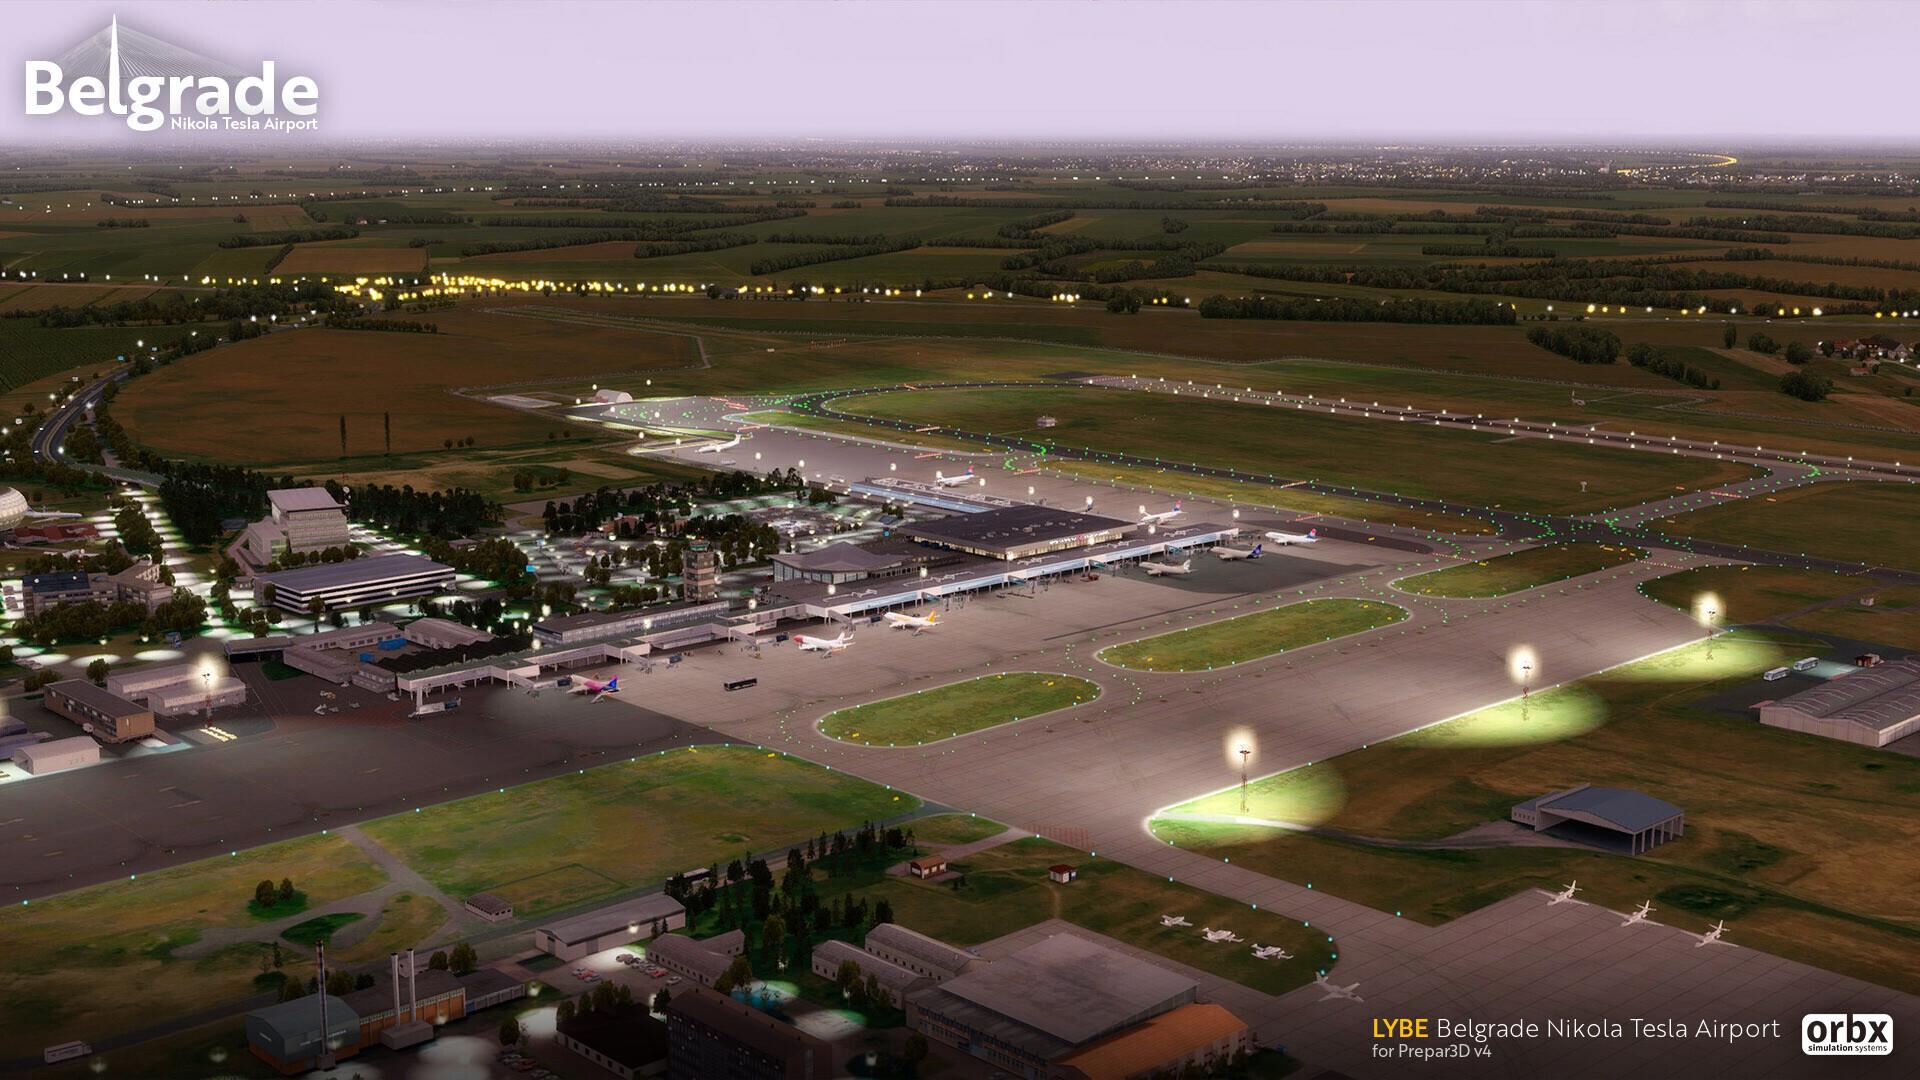 LYBE Belgrade Nikola Tesla Airport